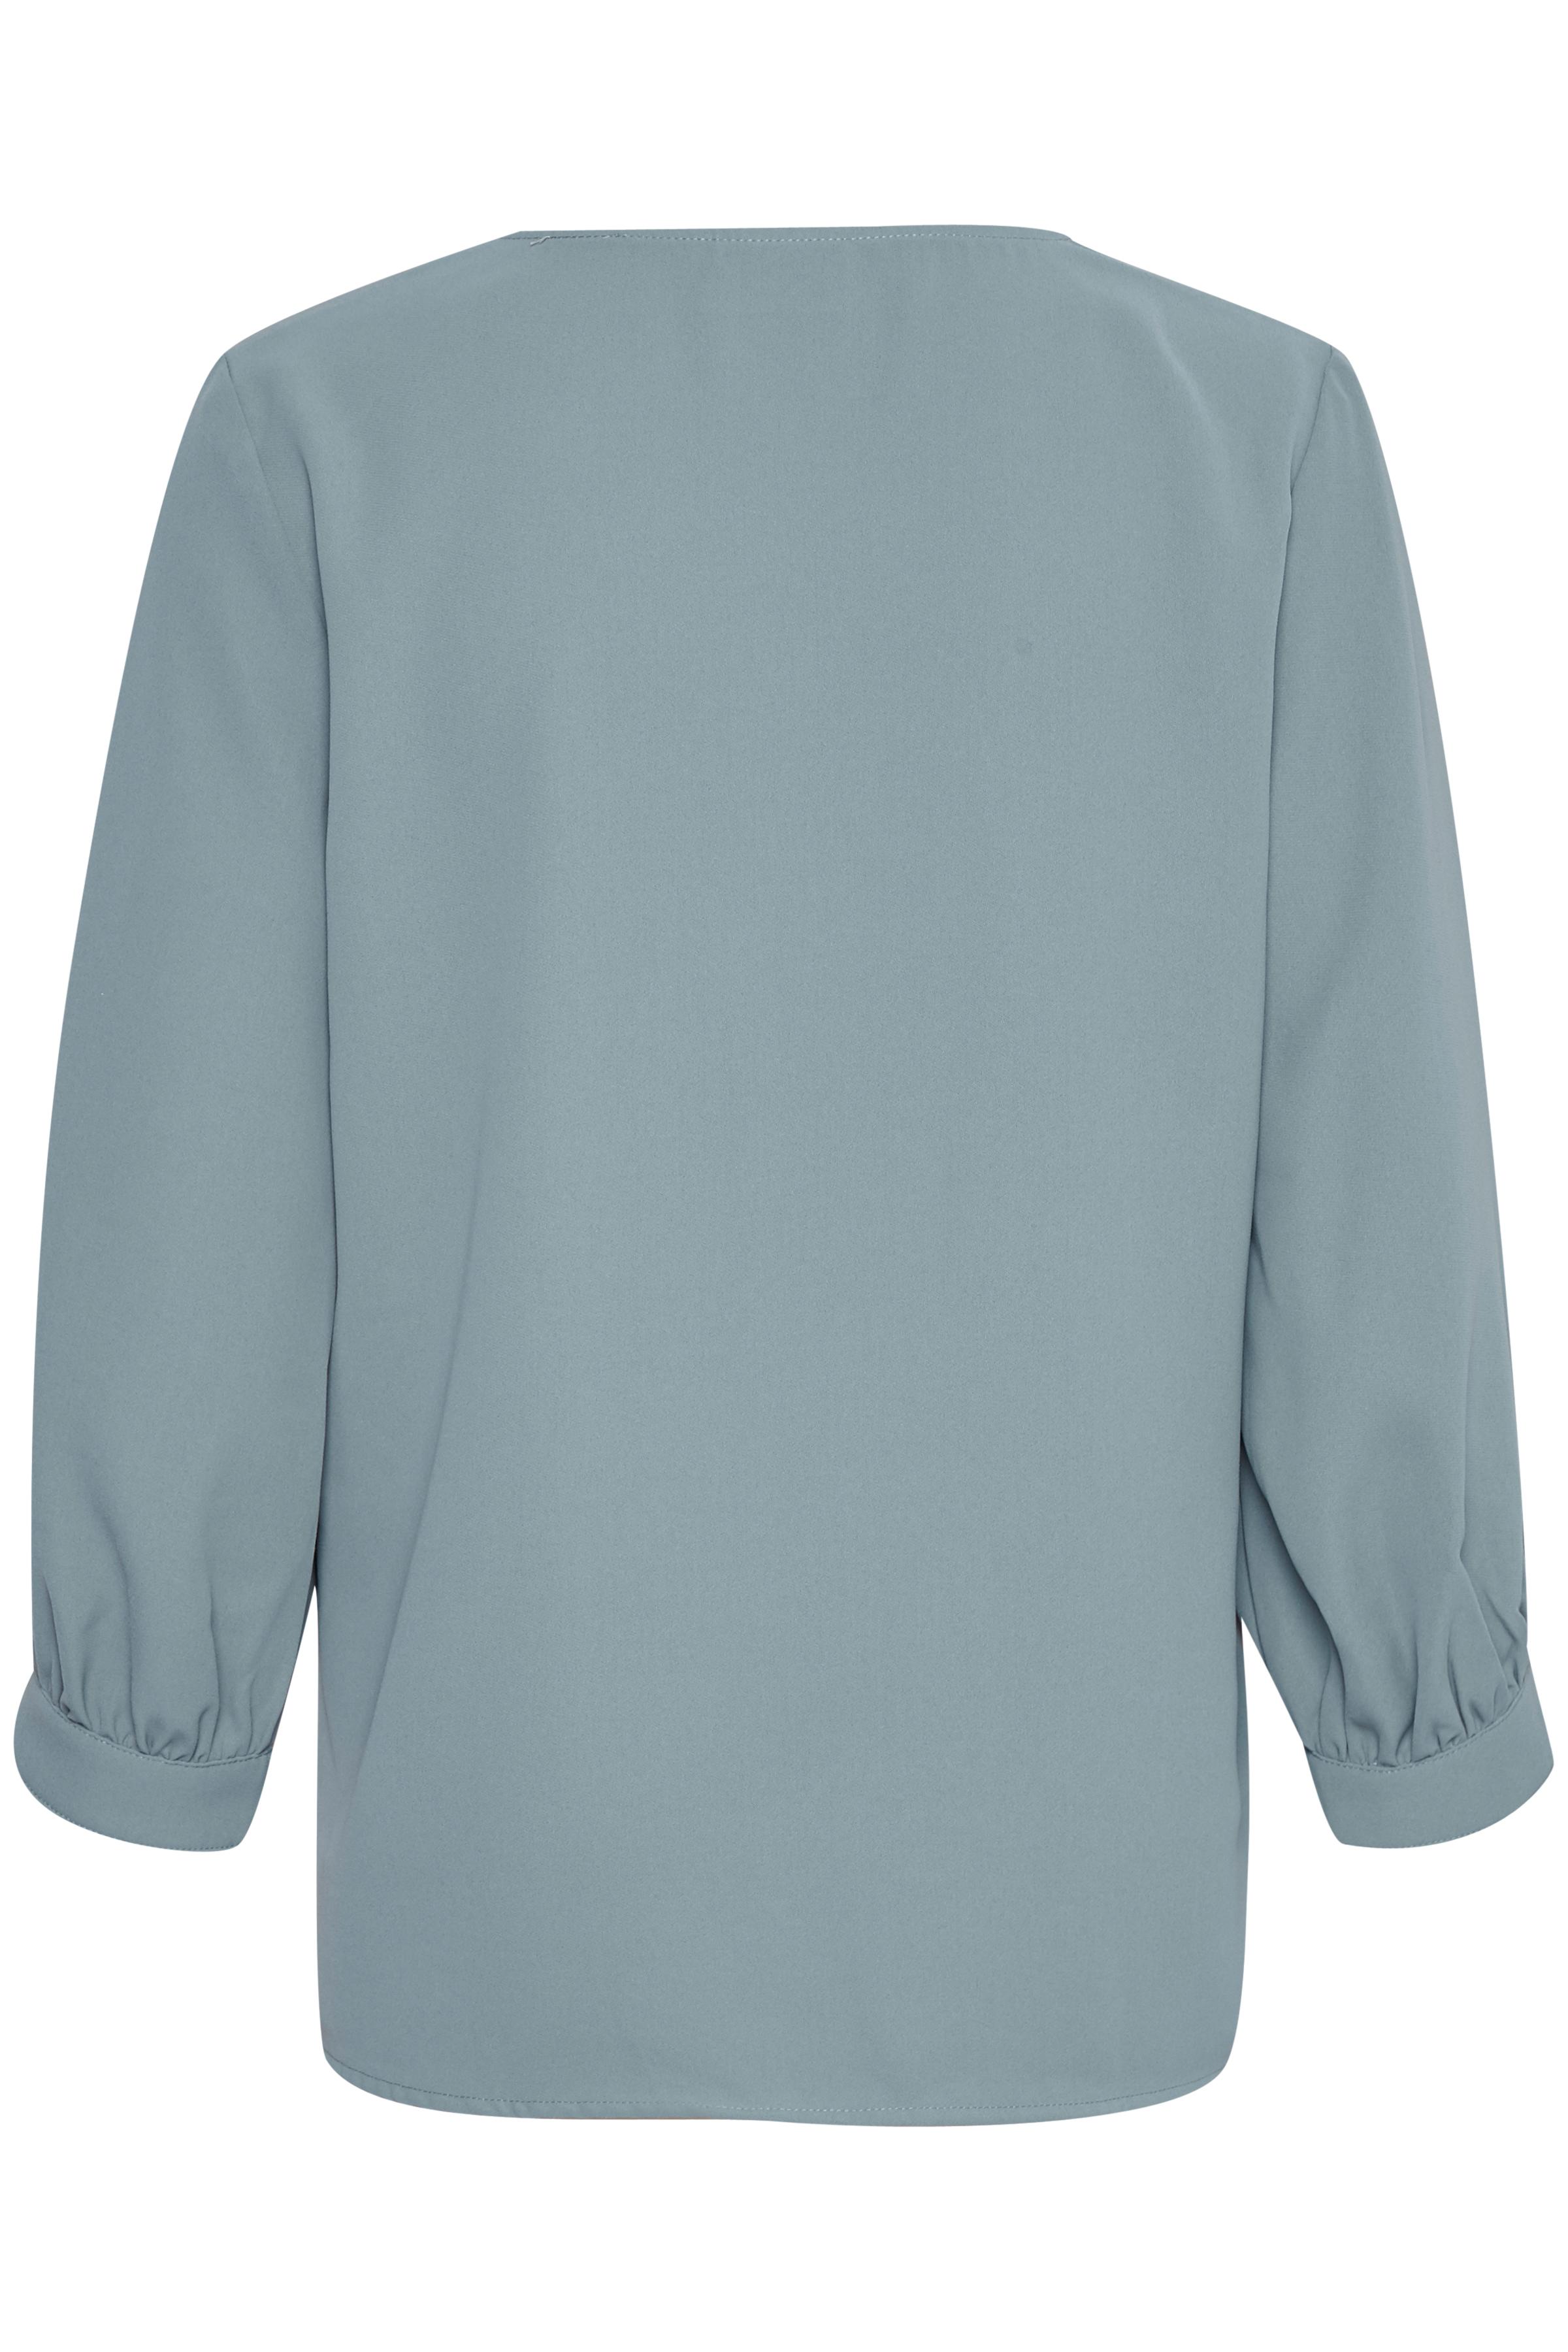 Staub blaugrau Langarm-Bluse von Kaffe – Shoppen SieStaub blaugrau Langarm-Bluse ab Gr. 34-46 hier